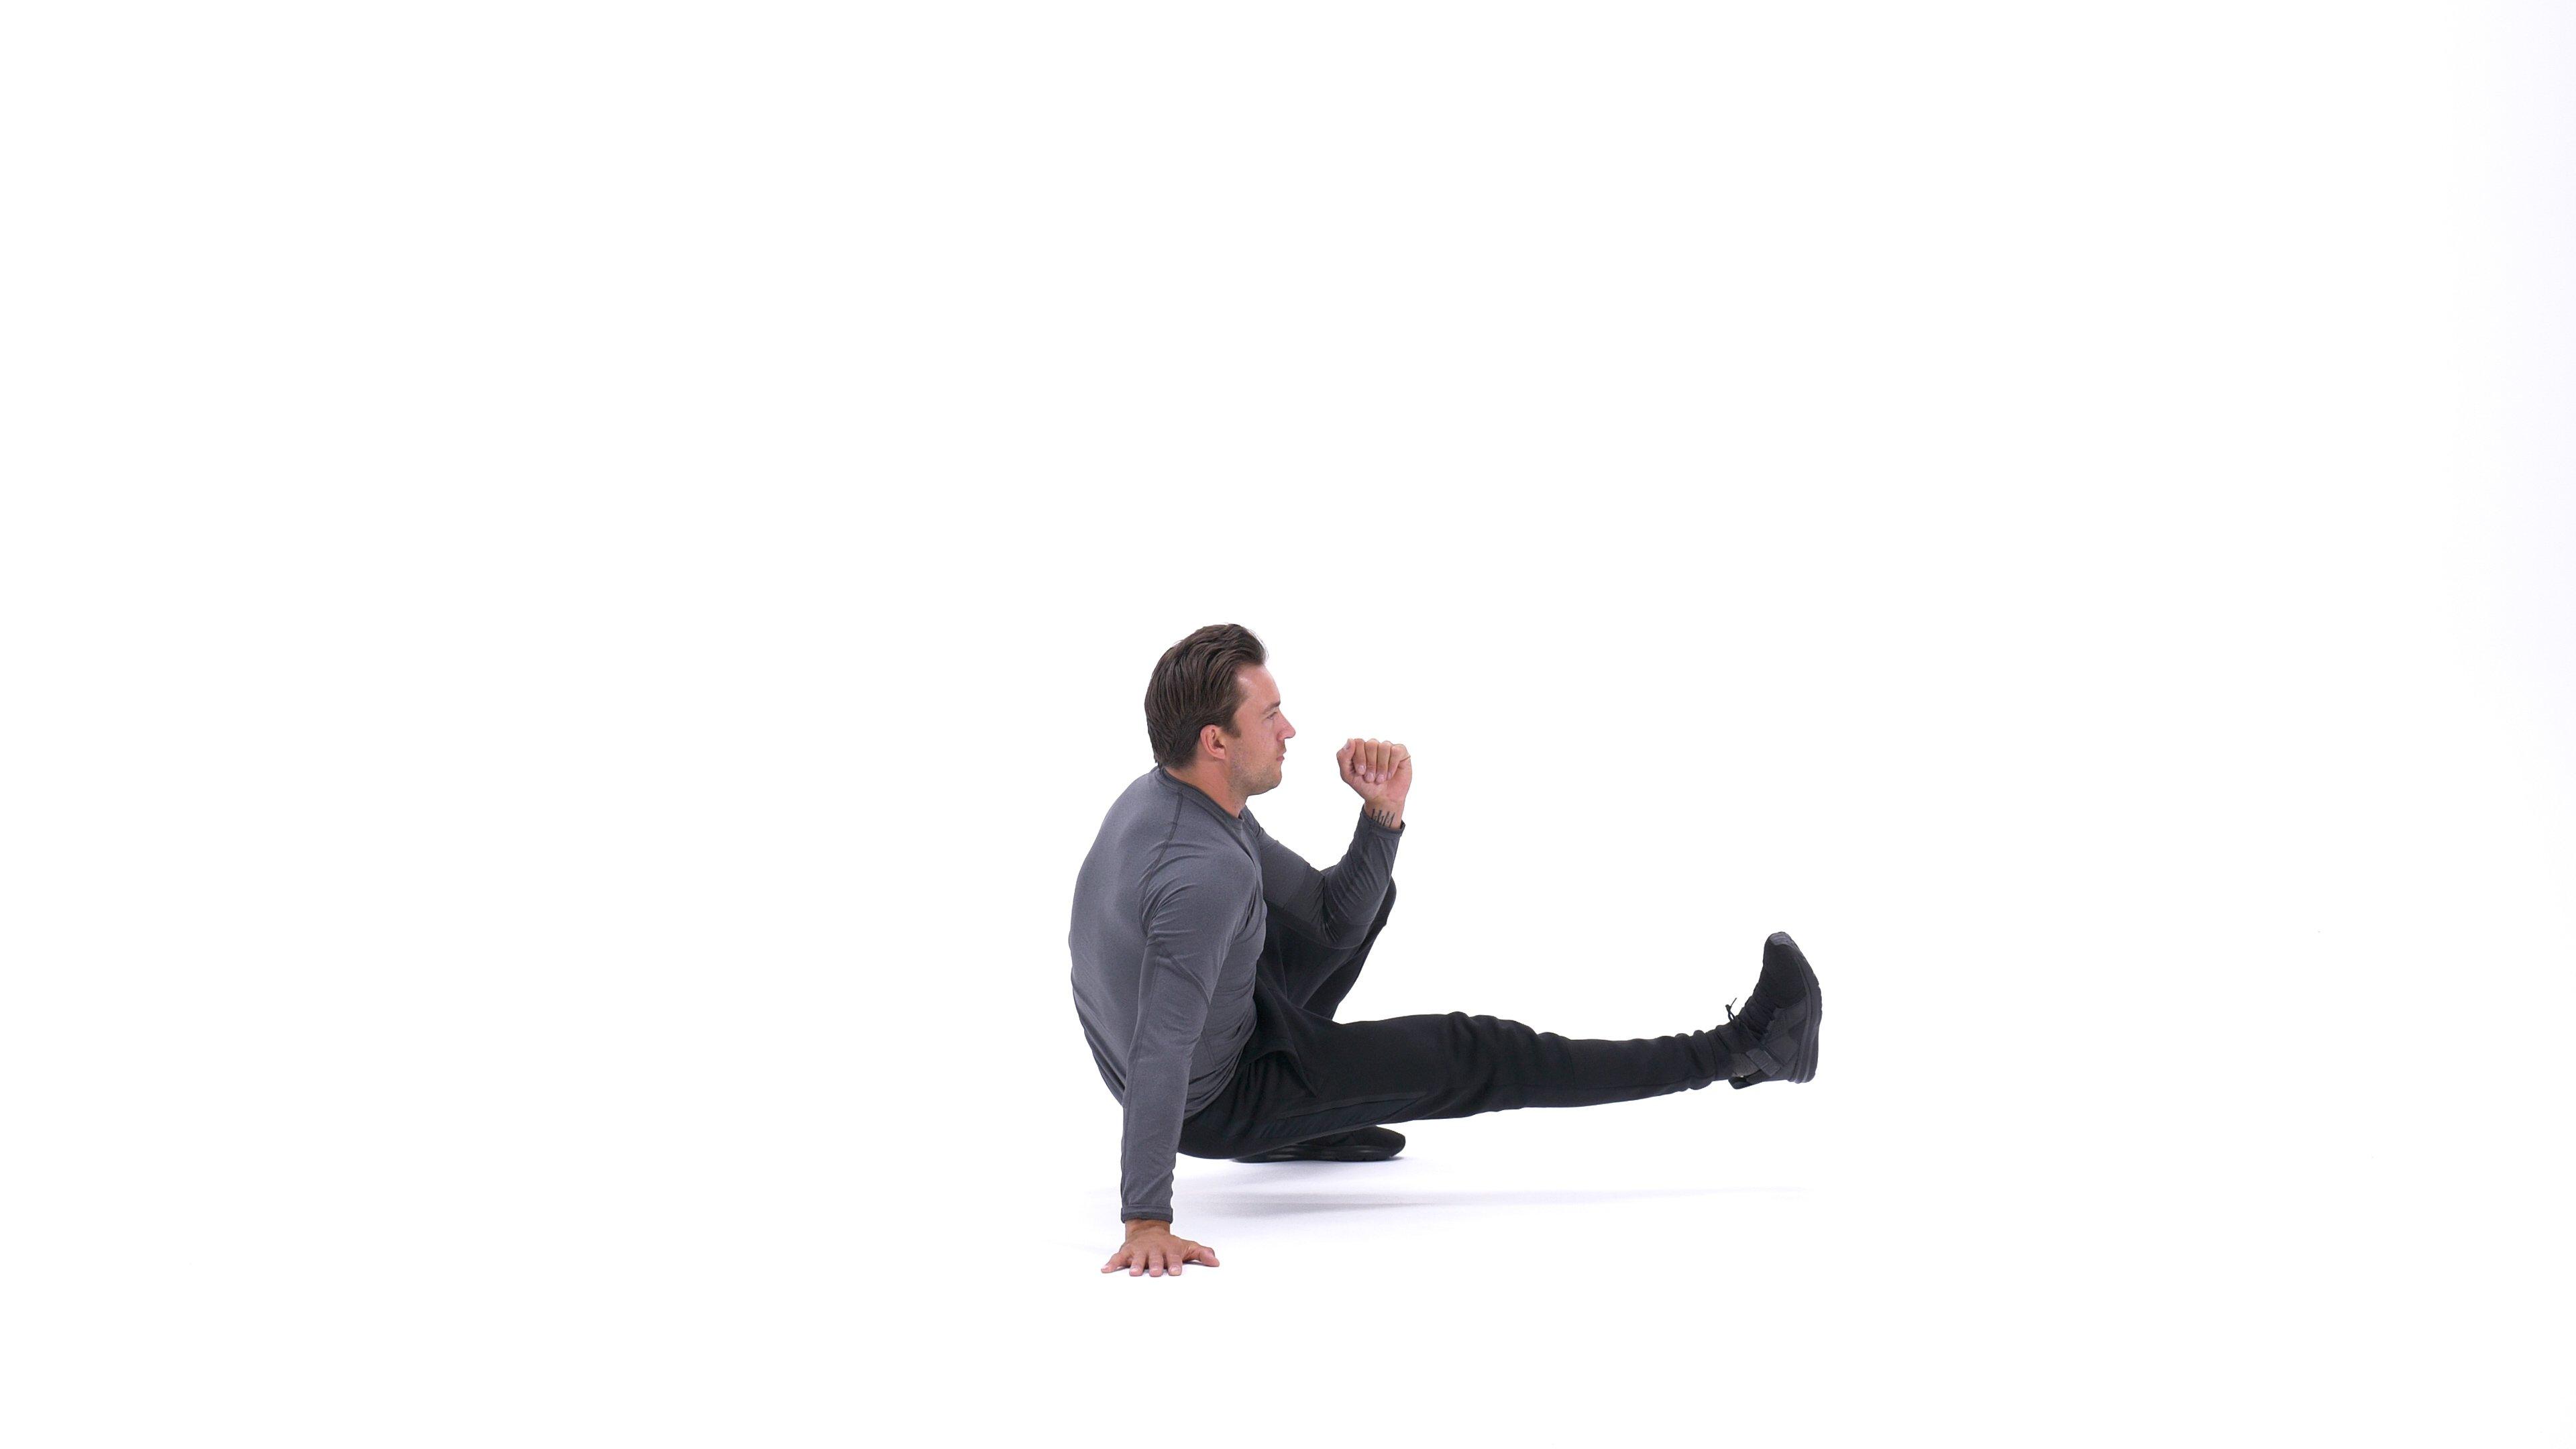 Side kick-through image